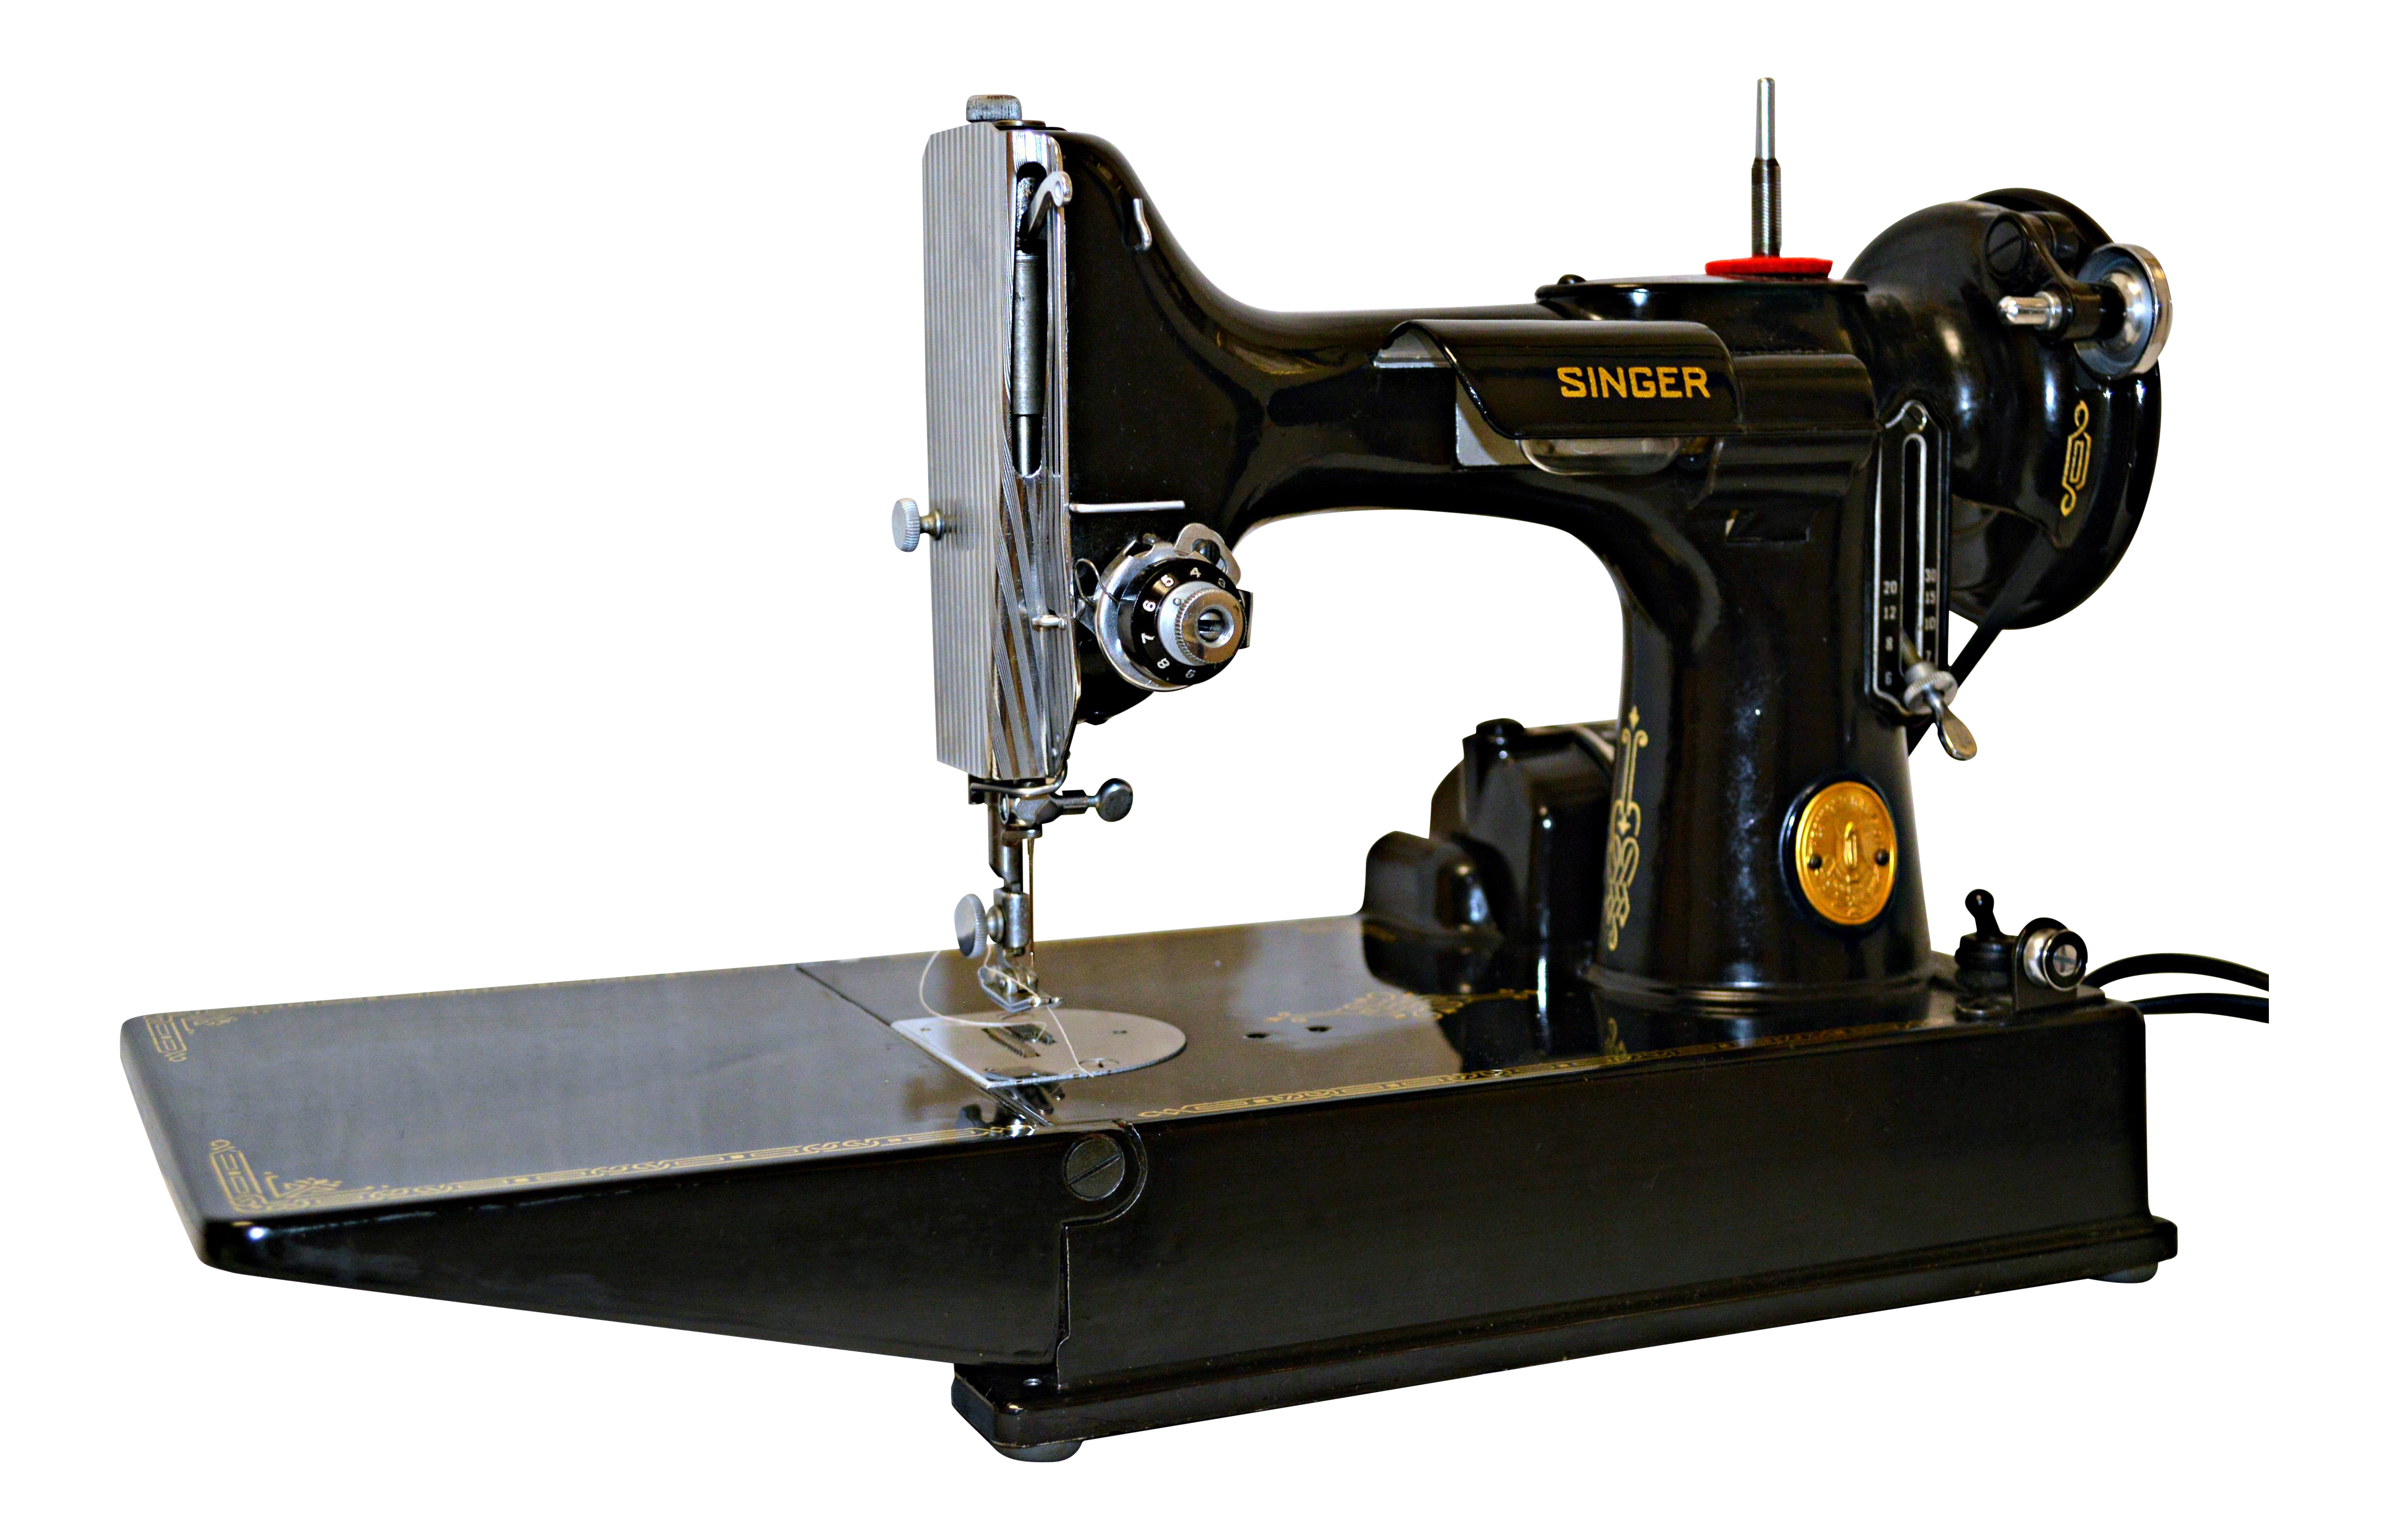 1951 singer featherweight sewing machine